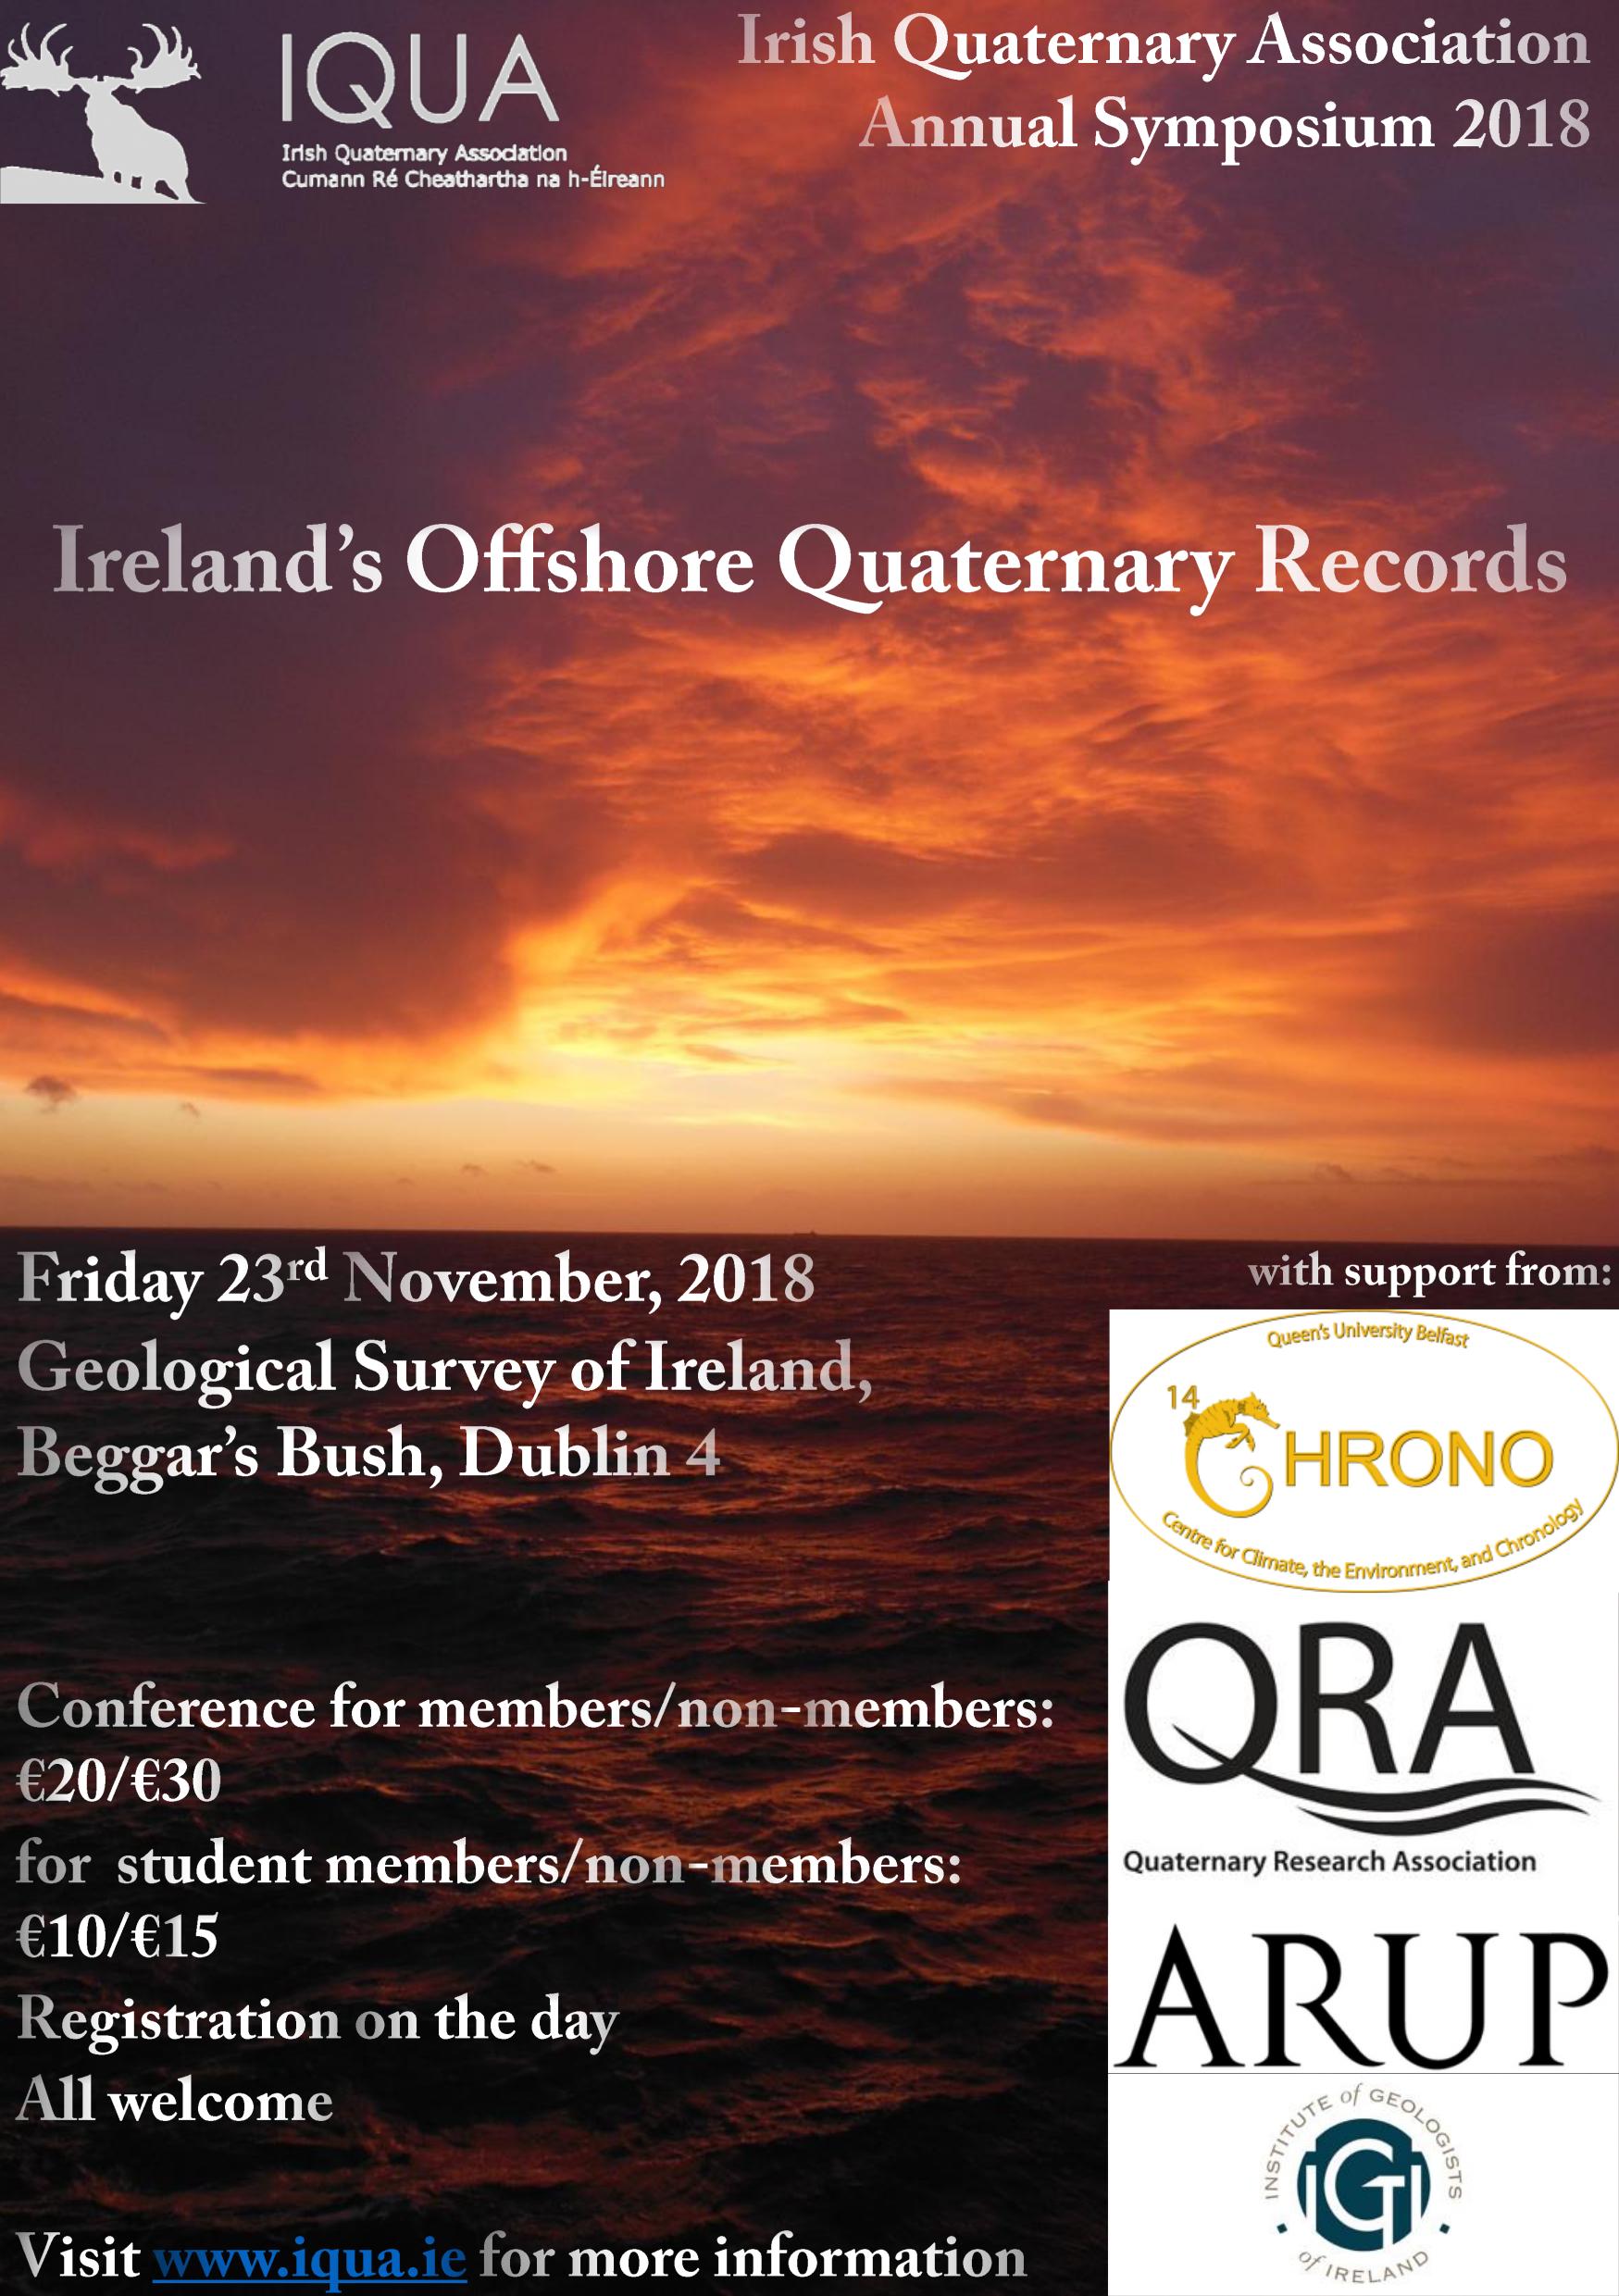 IQUA November 2018 Symposium: Ireland's Offshore Quaternary Records